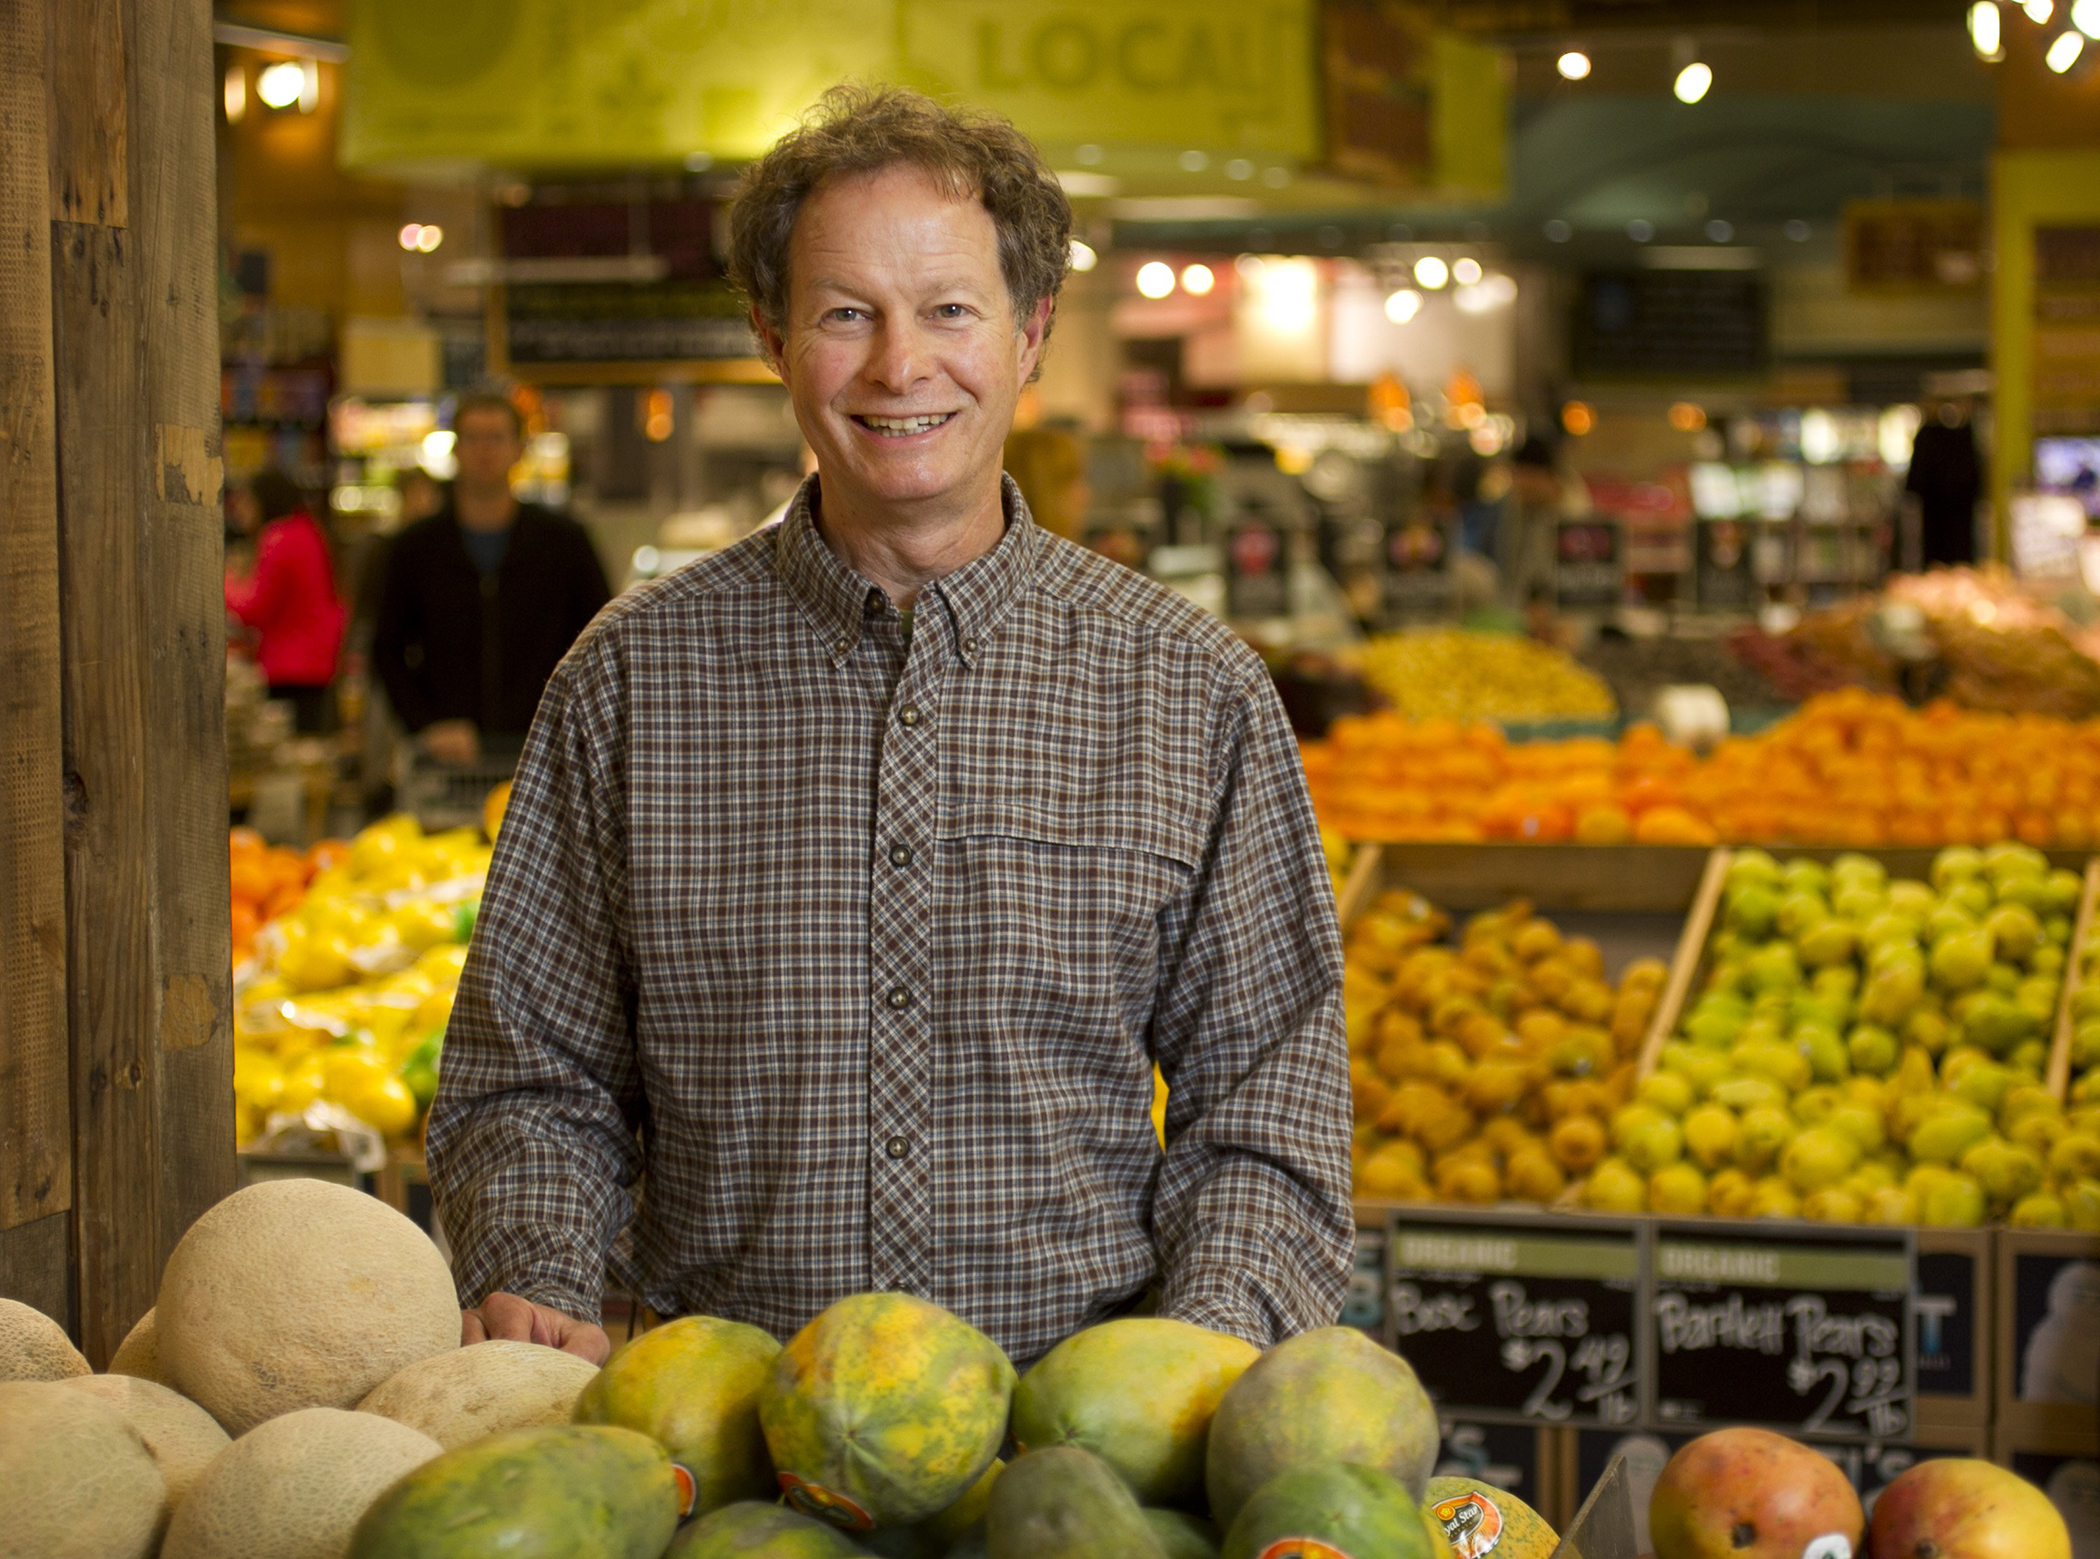 Whole Foods CEO John Mackey on December 31, 2012.